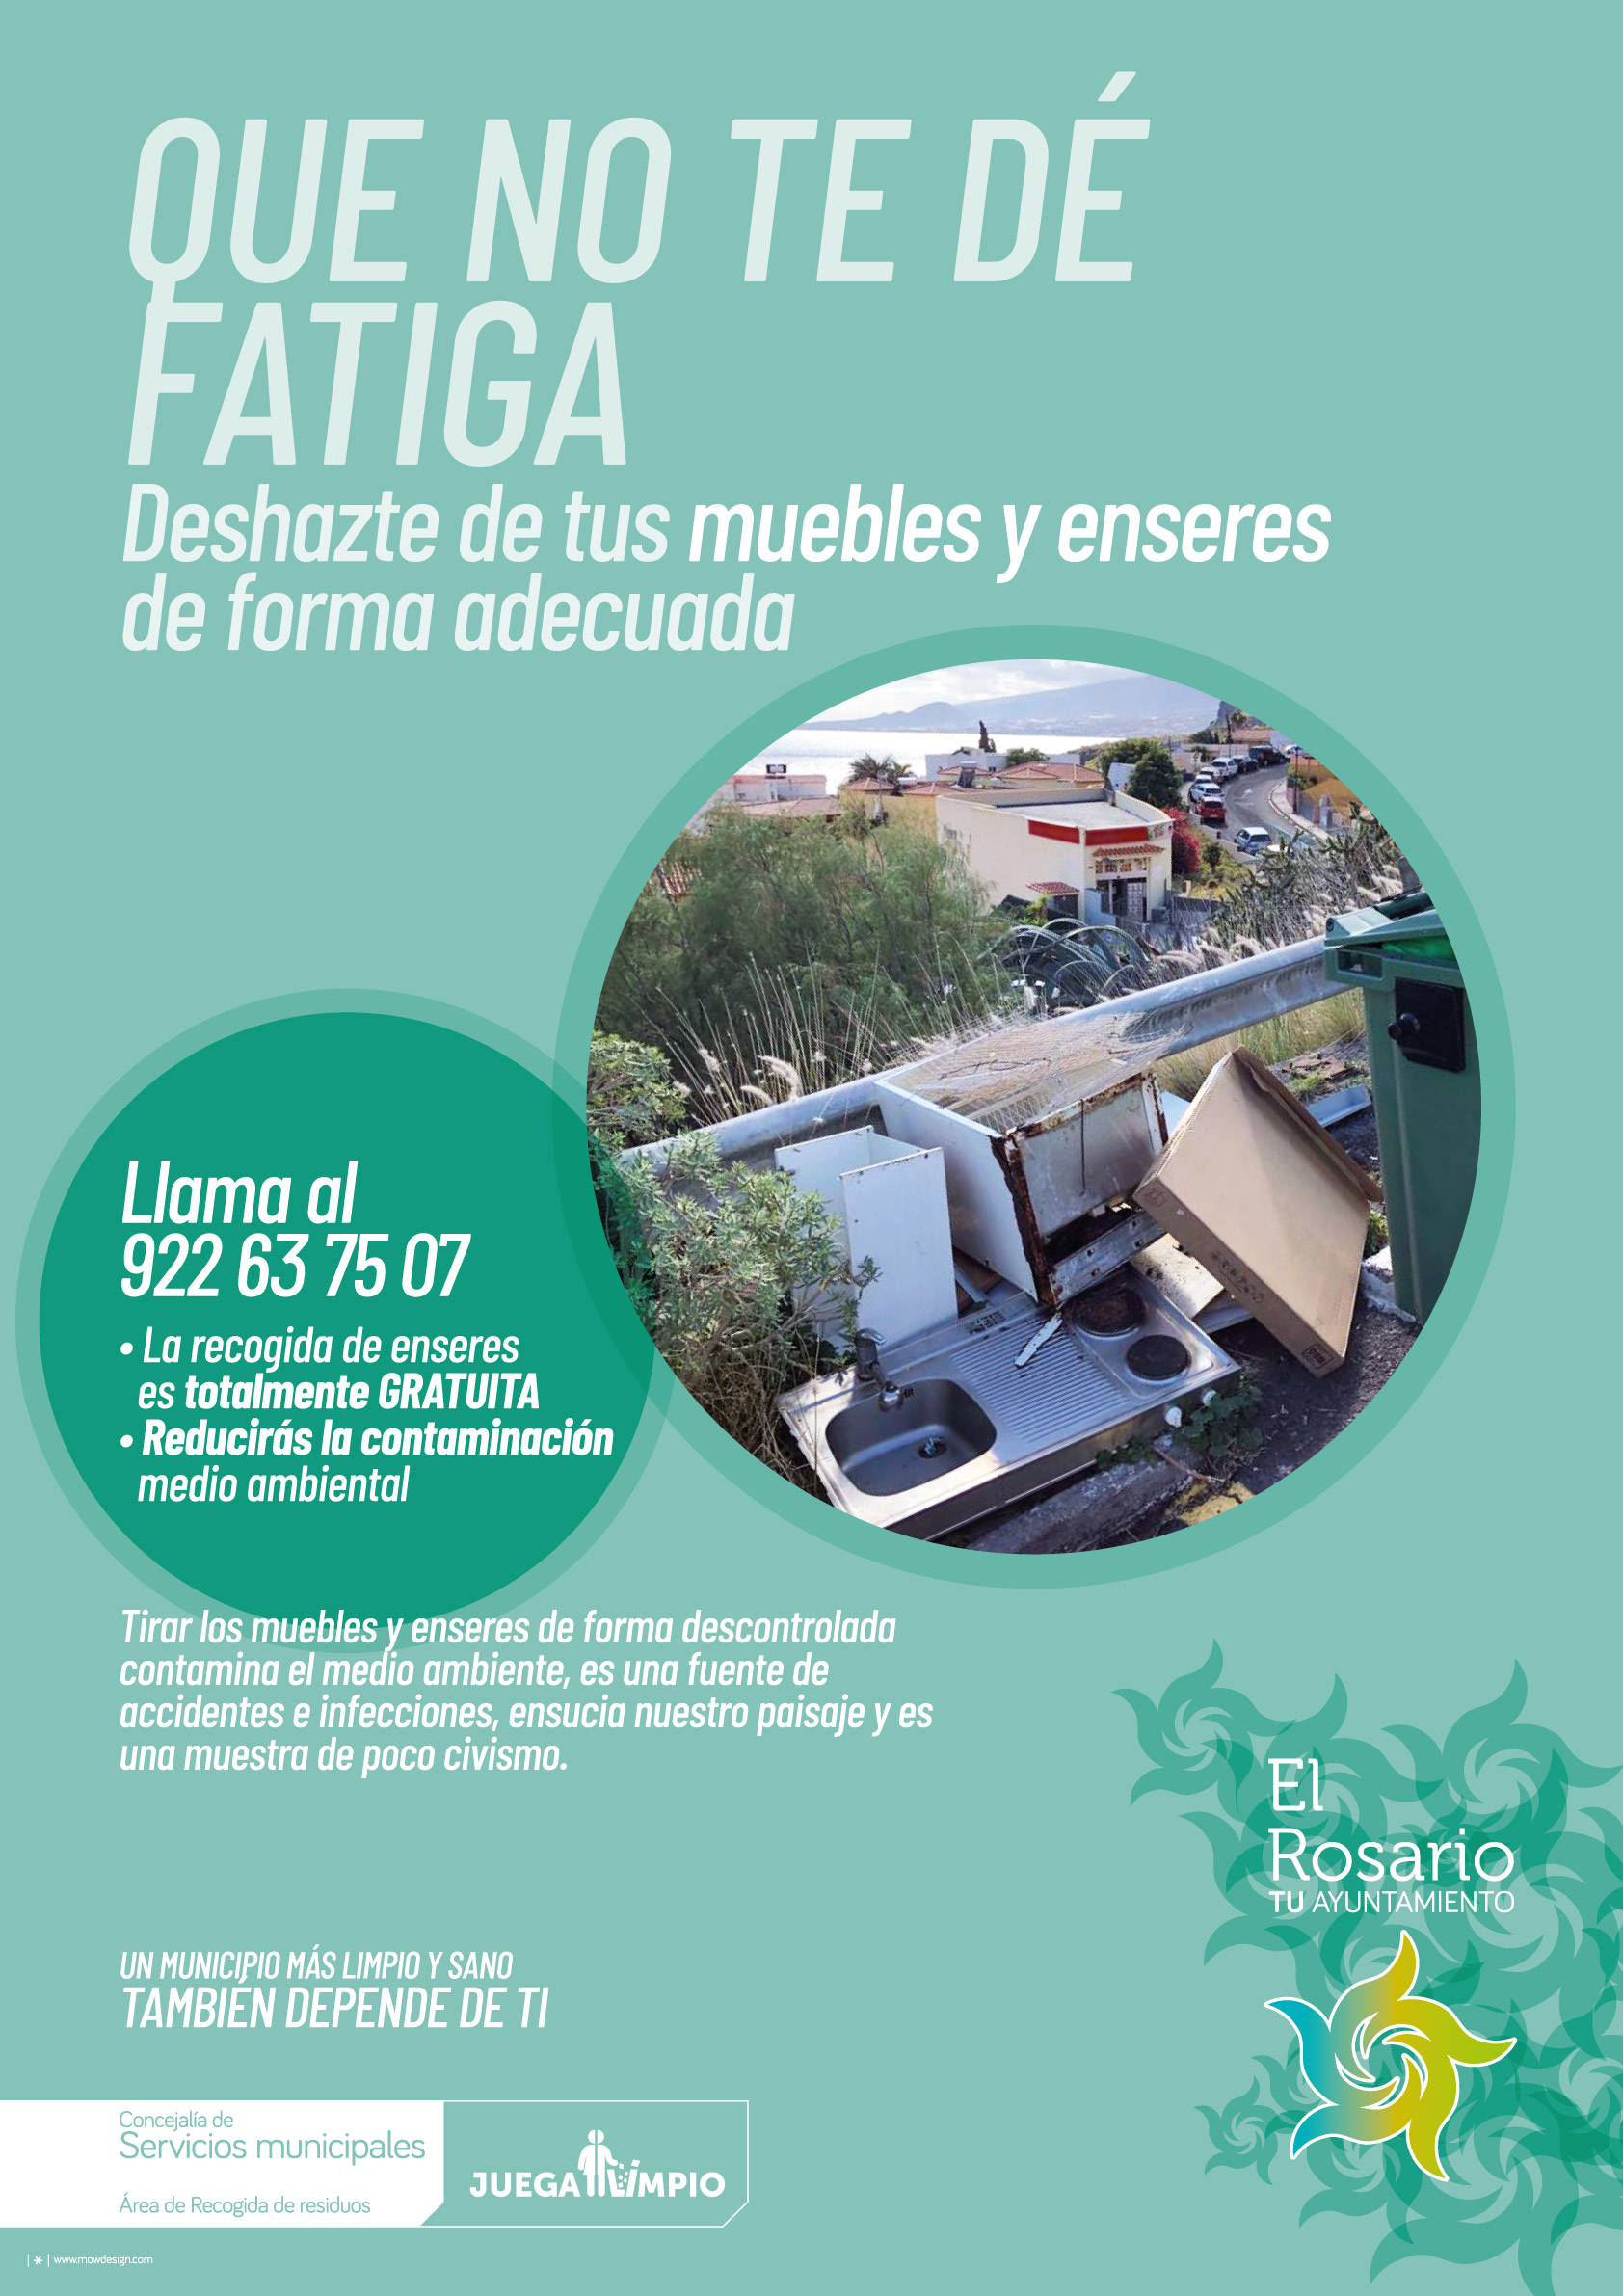 CAMPANIA-QUE_NO_TE_DE_FATIGA-ENSERES-20190000-CARTEL_a3-20190324-01af-redes